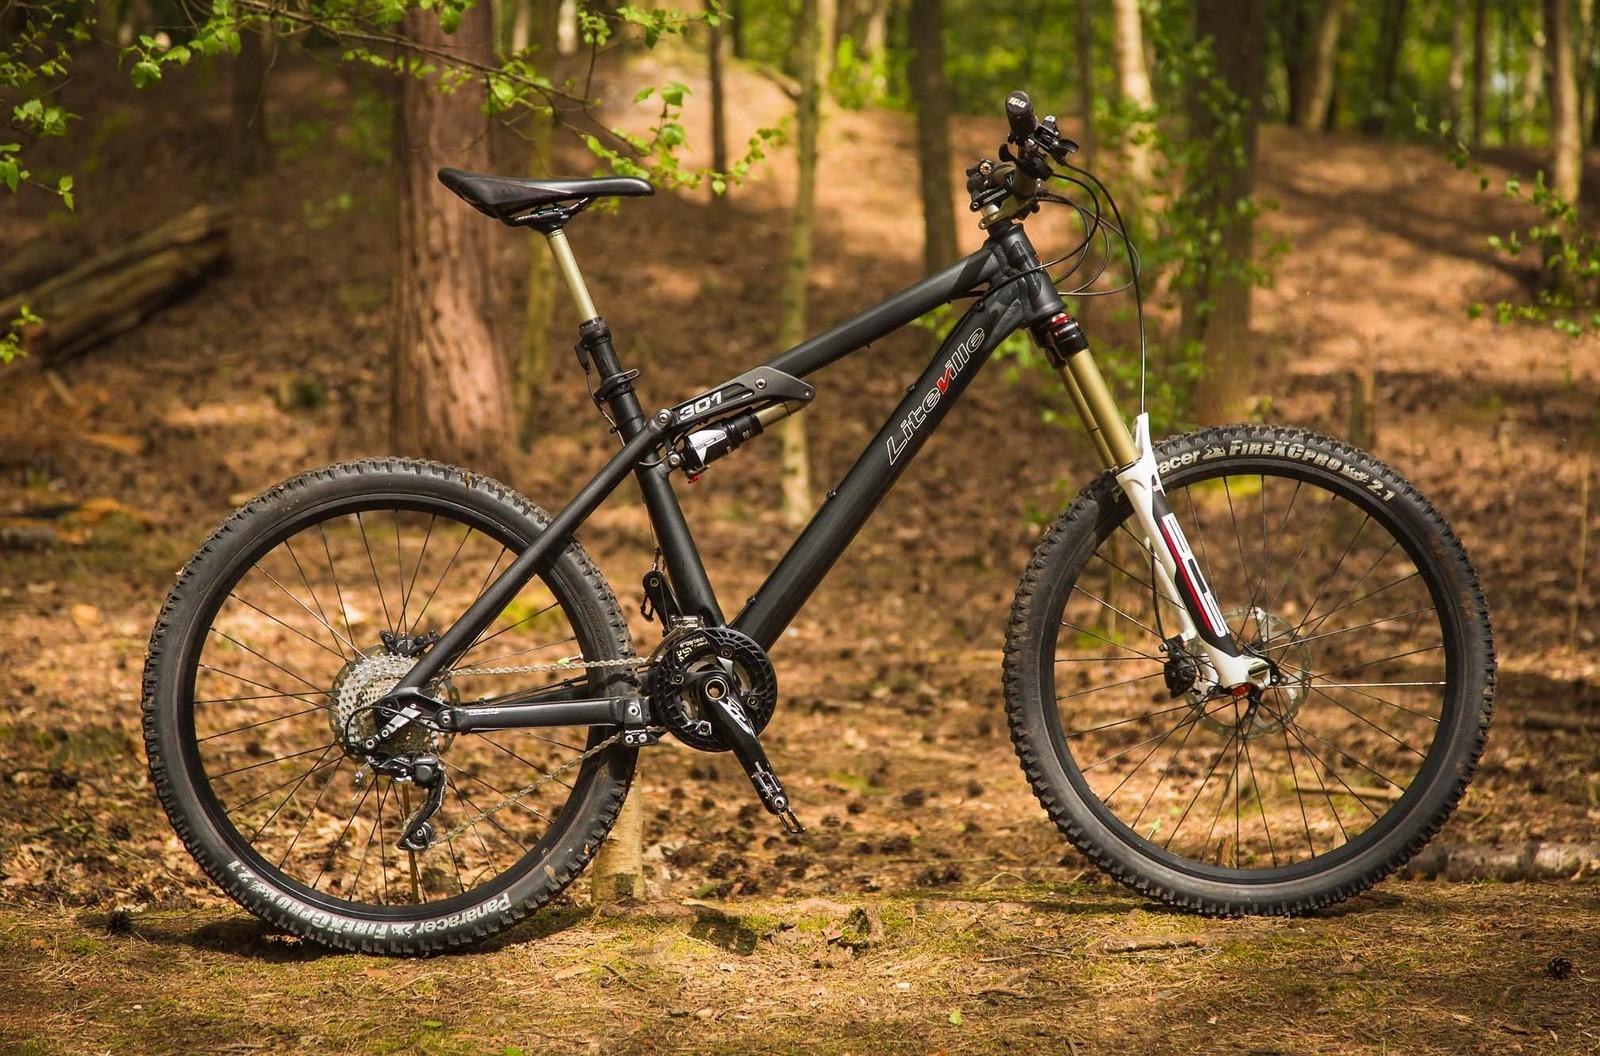 Liteville 301 mk11 m  3 - teknorob - Mountain Biking Pictures - Vital MTB